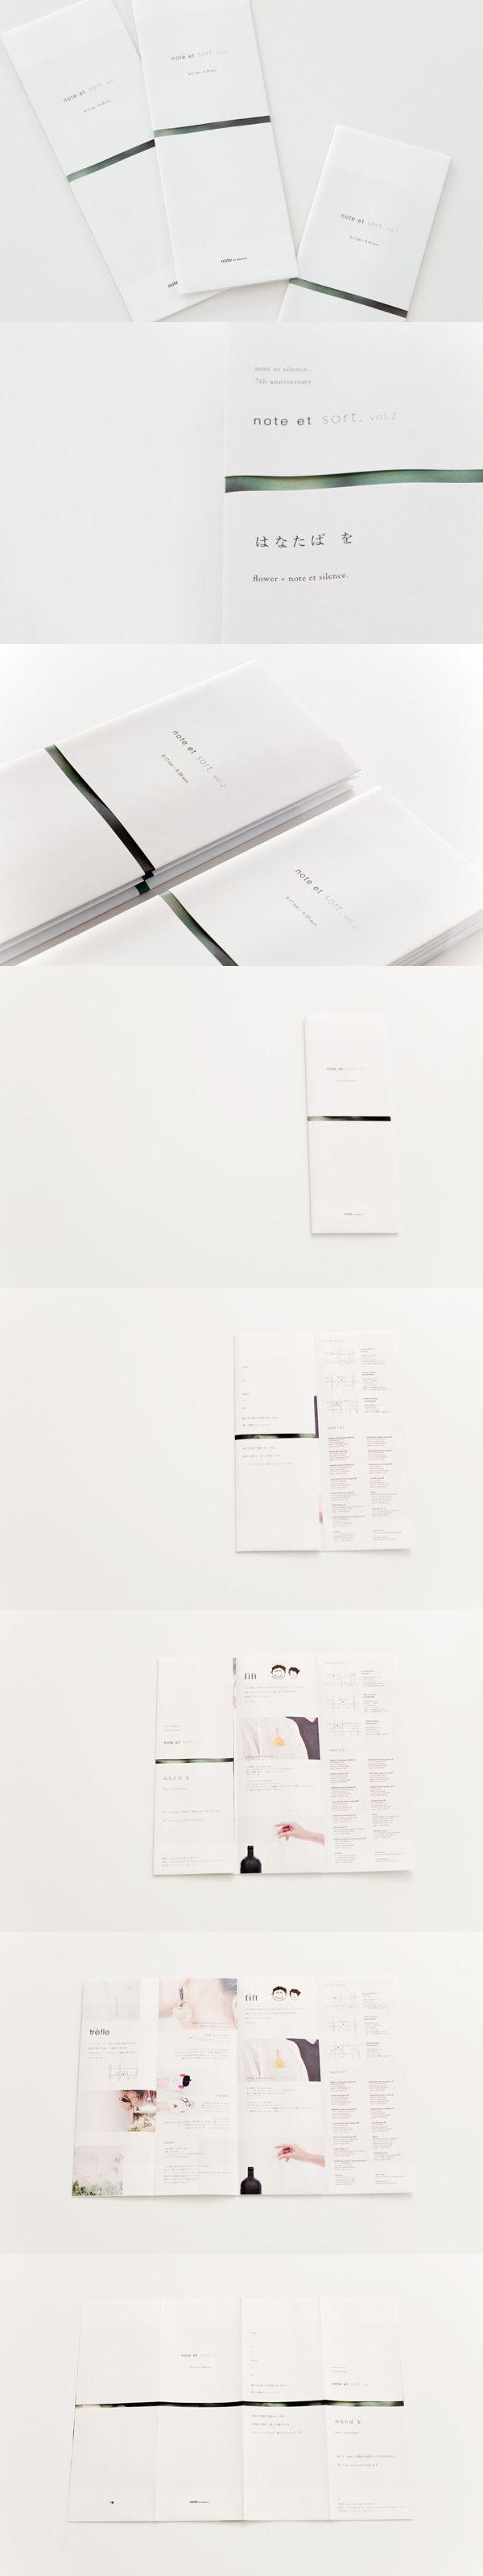 ≪note et silence. によるイベントのためのハンドアウト≫ note et sort. vol.2 Handout | AMBIDEX Co., Ltd. 2011年 / 29.4 cm × 41.8cm / Mixed Media / Edition 1600 — Publisher: AMBIDEX Co., Ltd. Management: Tomoko Komiya (AMBIDEX Co., Ltd.) Agency: NSSGRAPHICA PrintDirection: Mika Yamada (Sanwa Printing Co., Ltd.) Gestaltung: Makoto Kamimura (c) Makoto Kamimura, AMBIDEX Co., Ltd.